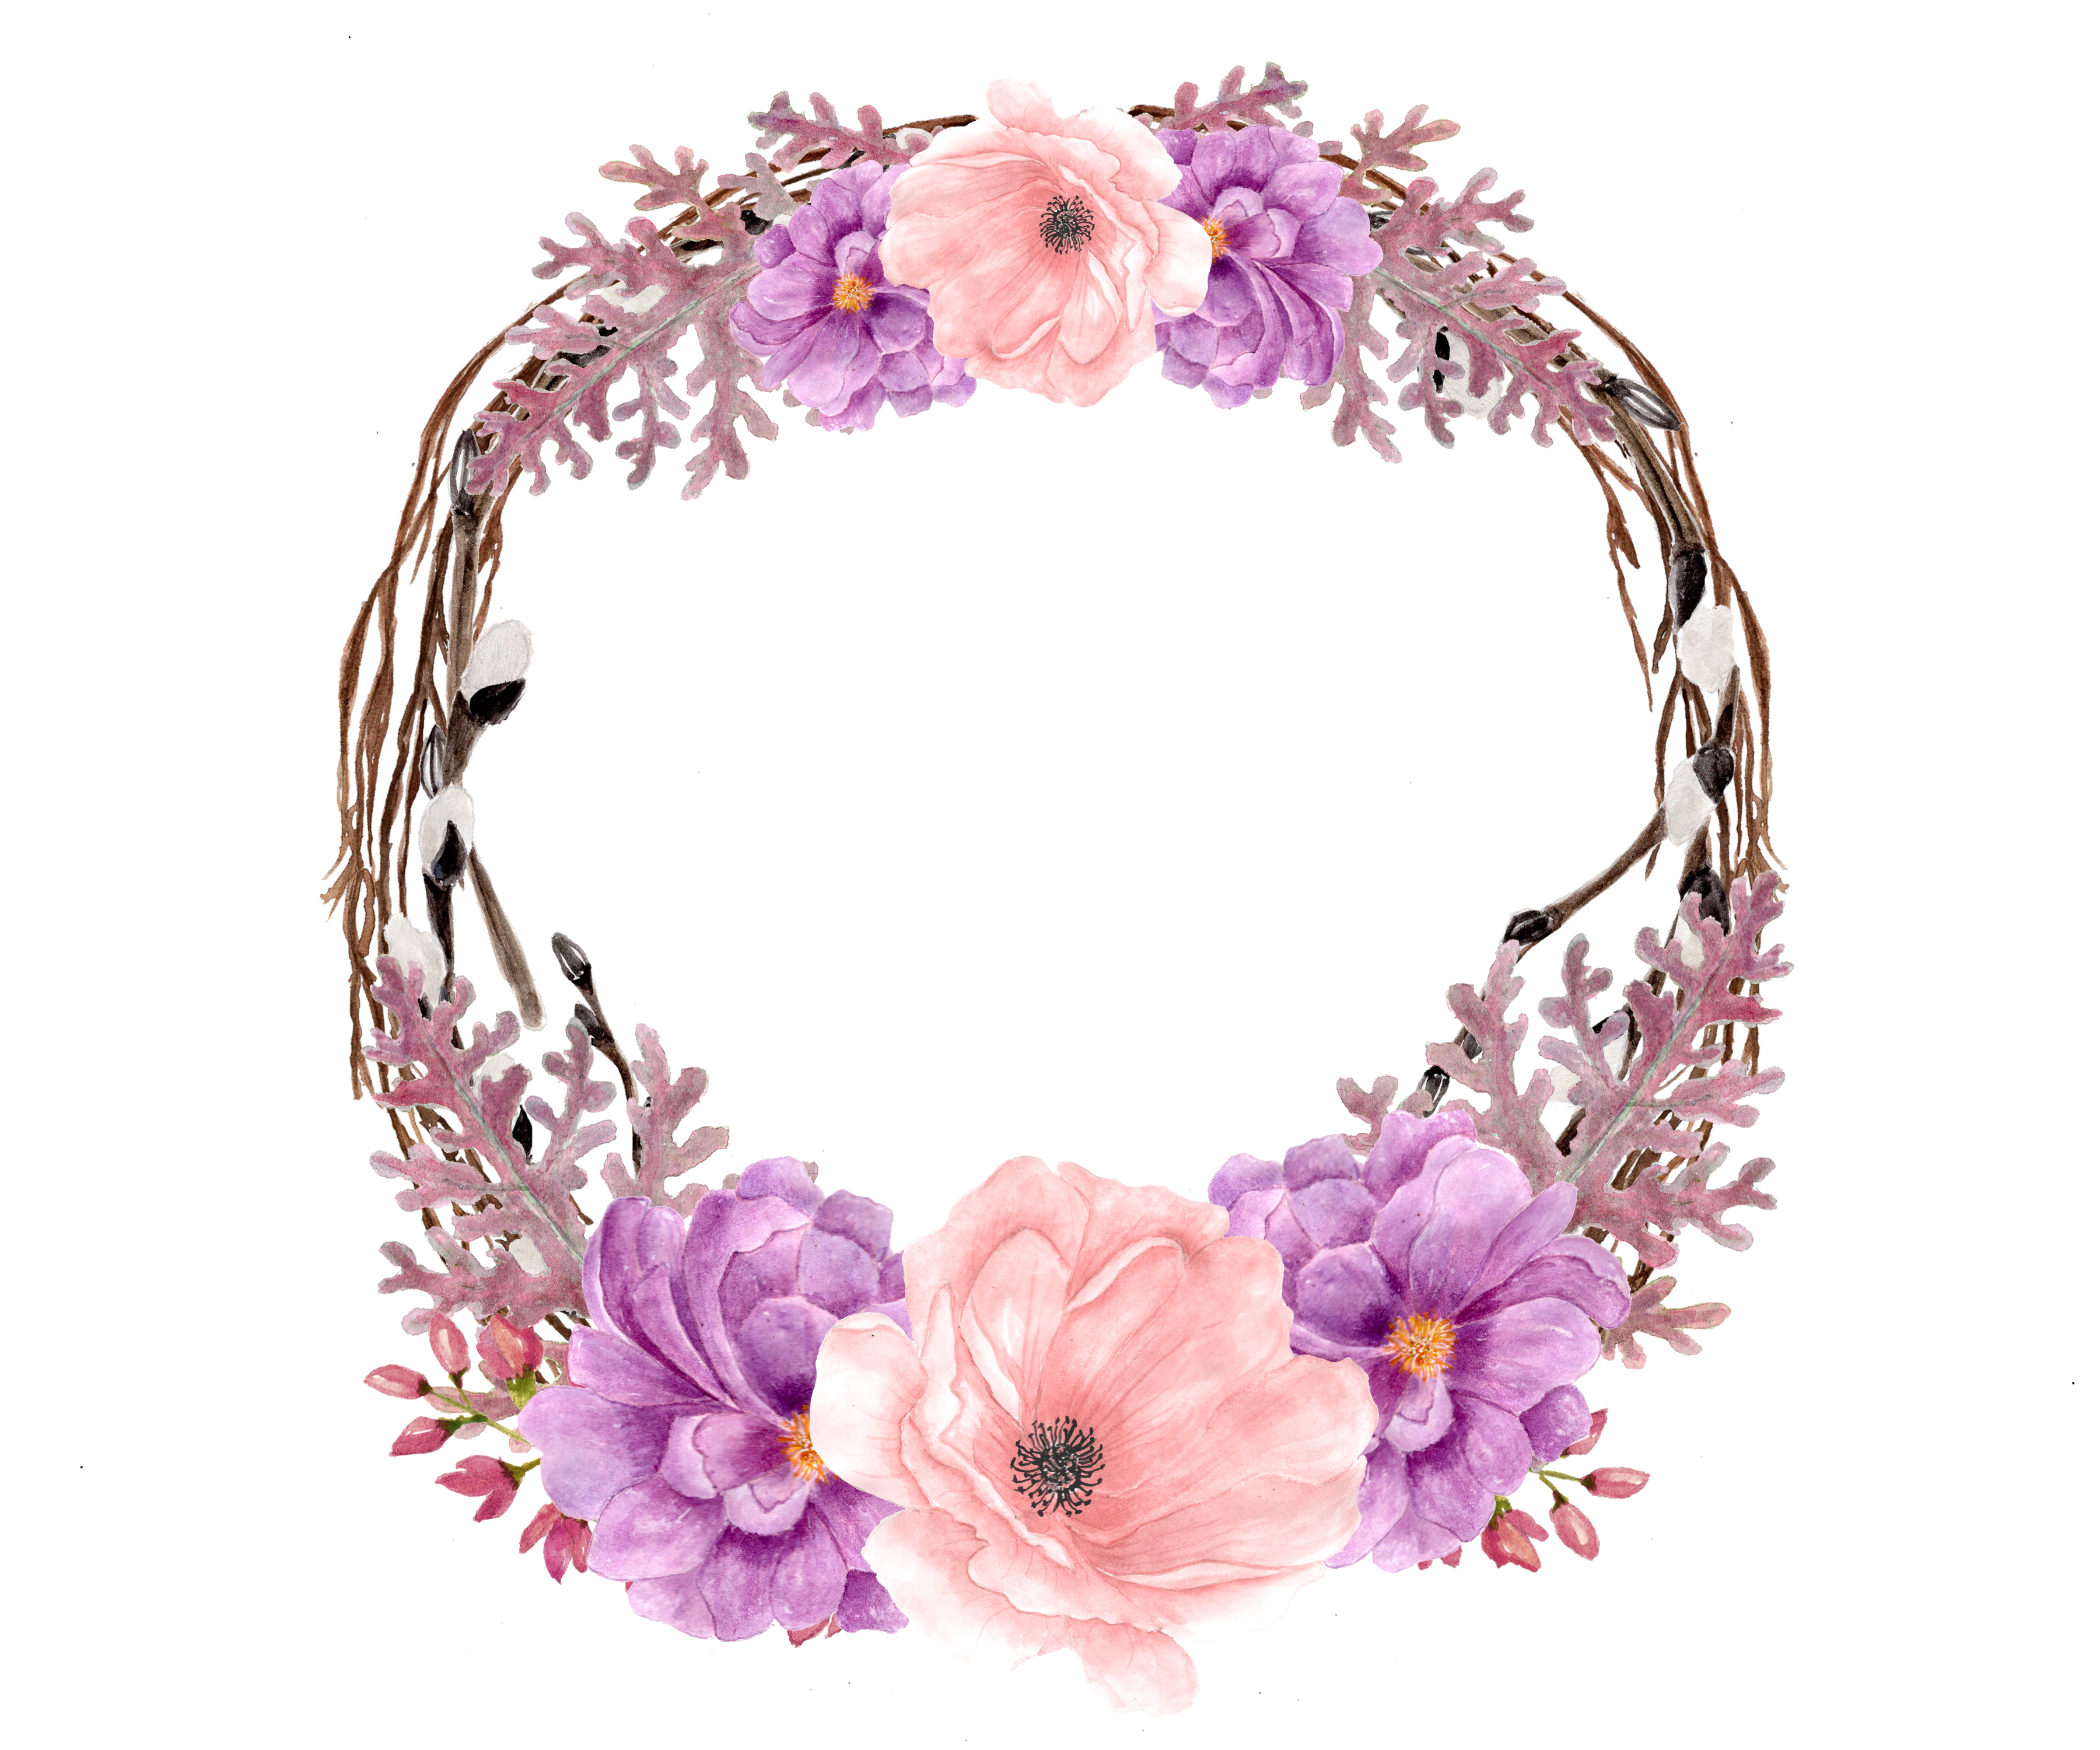 Wedding invitation watercolor painting. Lavender clipart decorative wreath